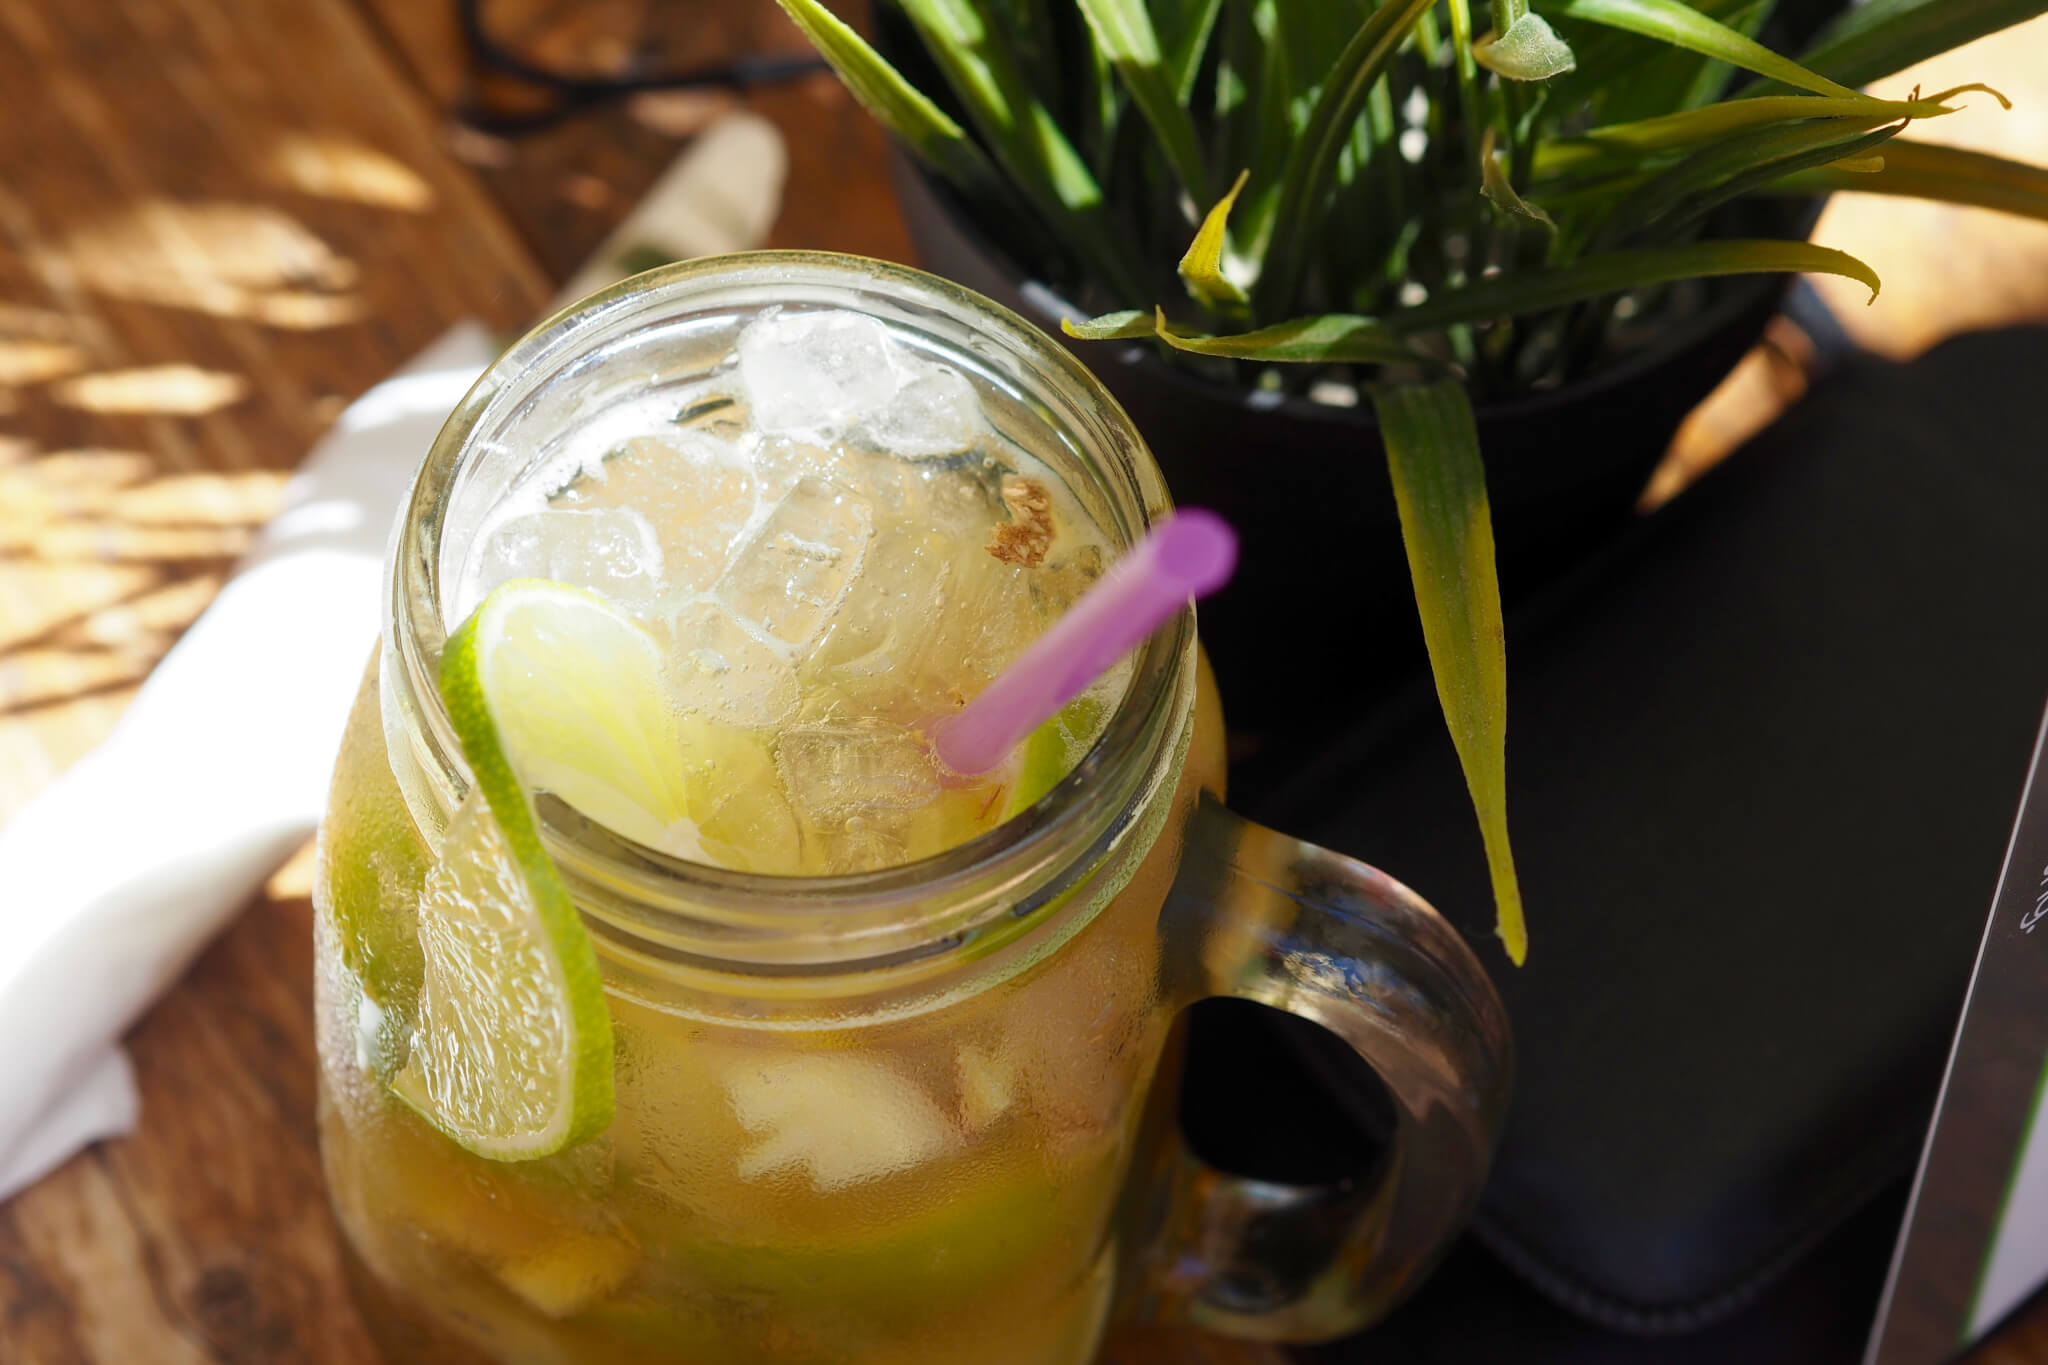 Lemonade mayanestorov